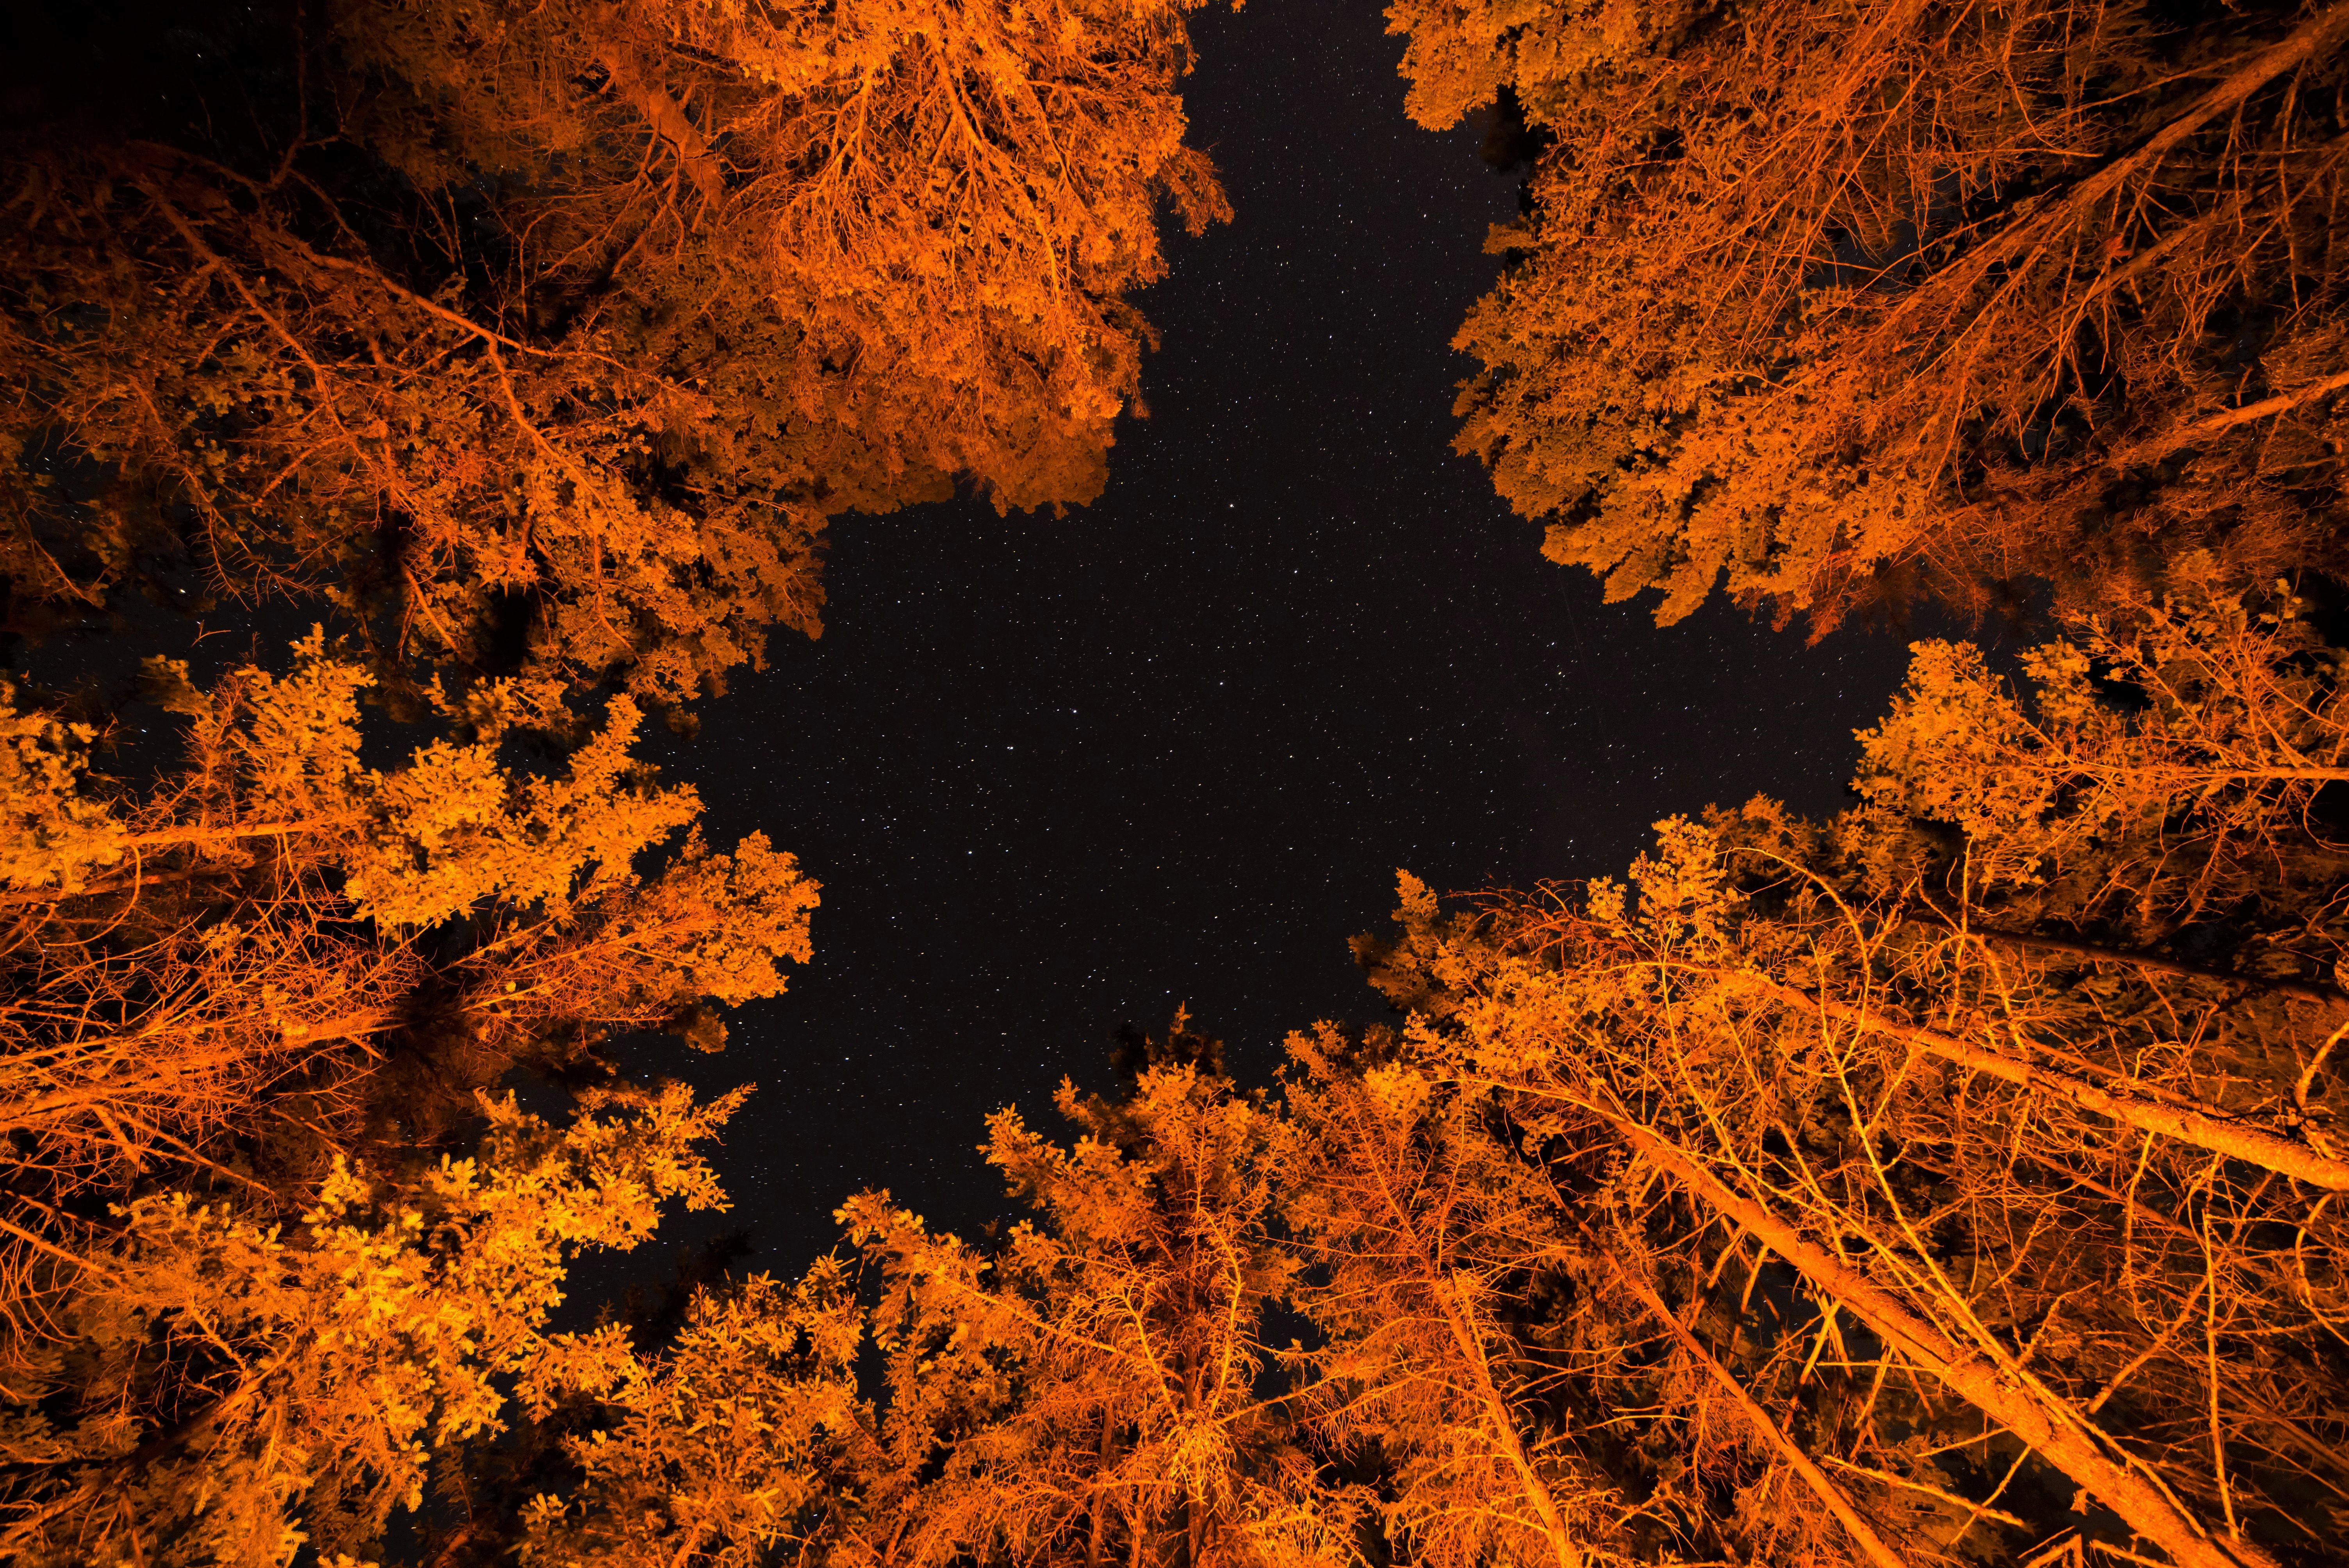 Canopy Earth Fall Foliage Forest Night Stars Tree Orange Color 6016x4016